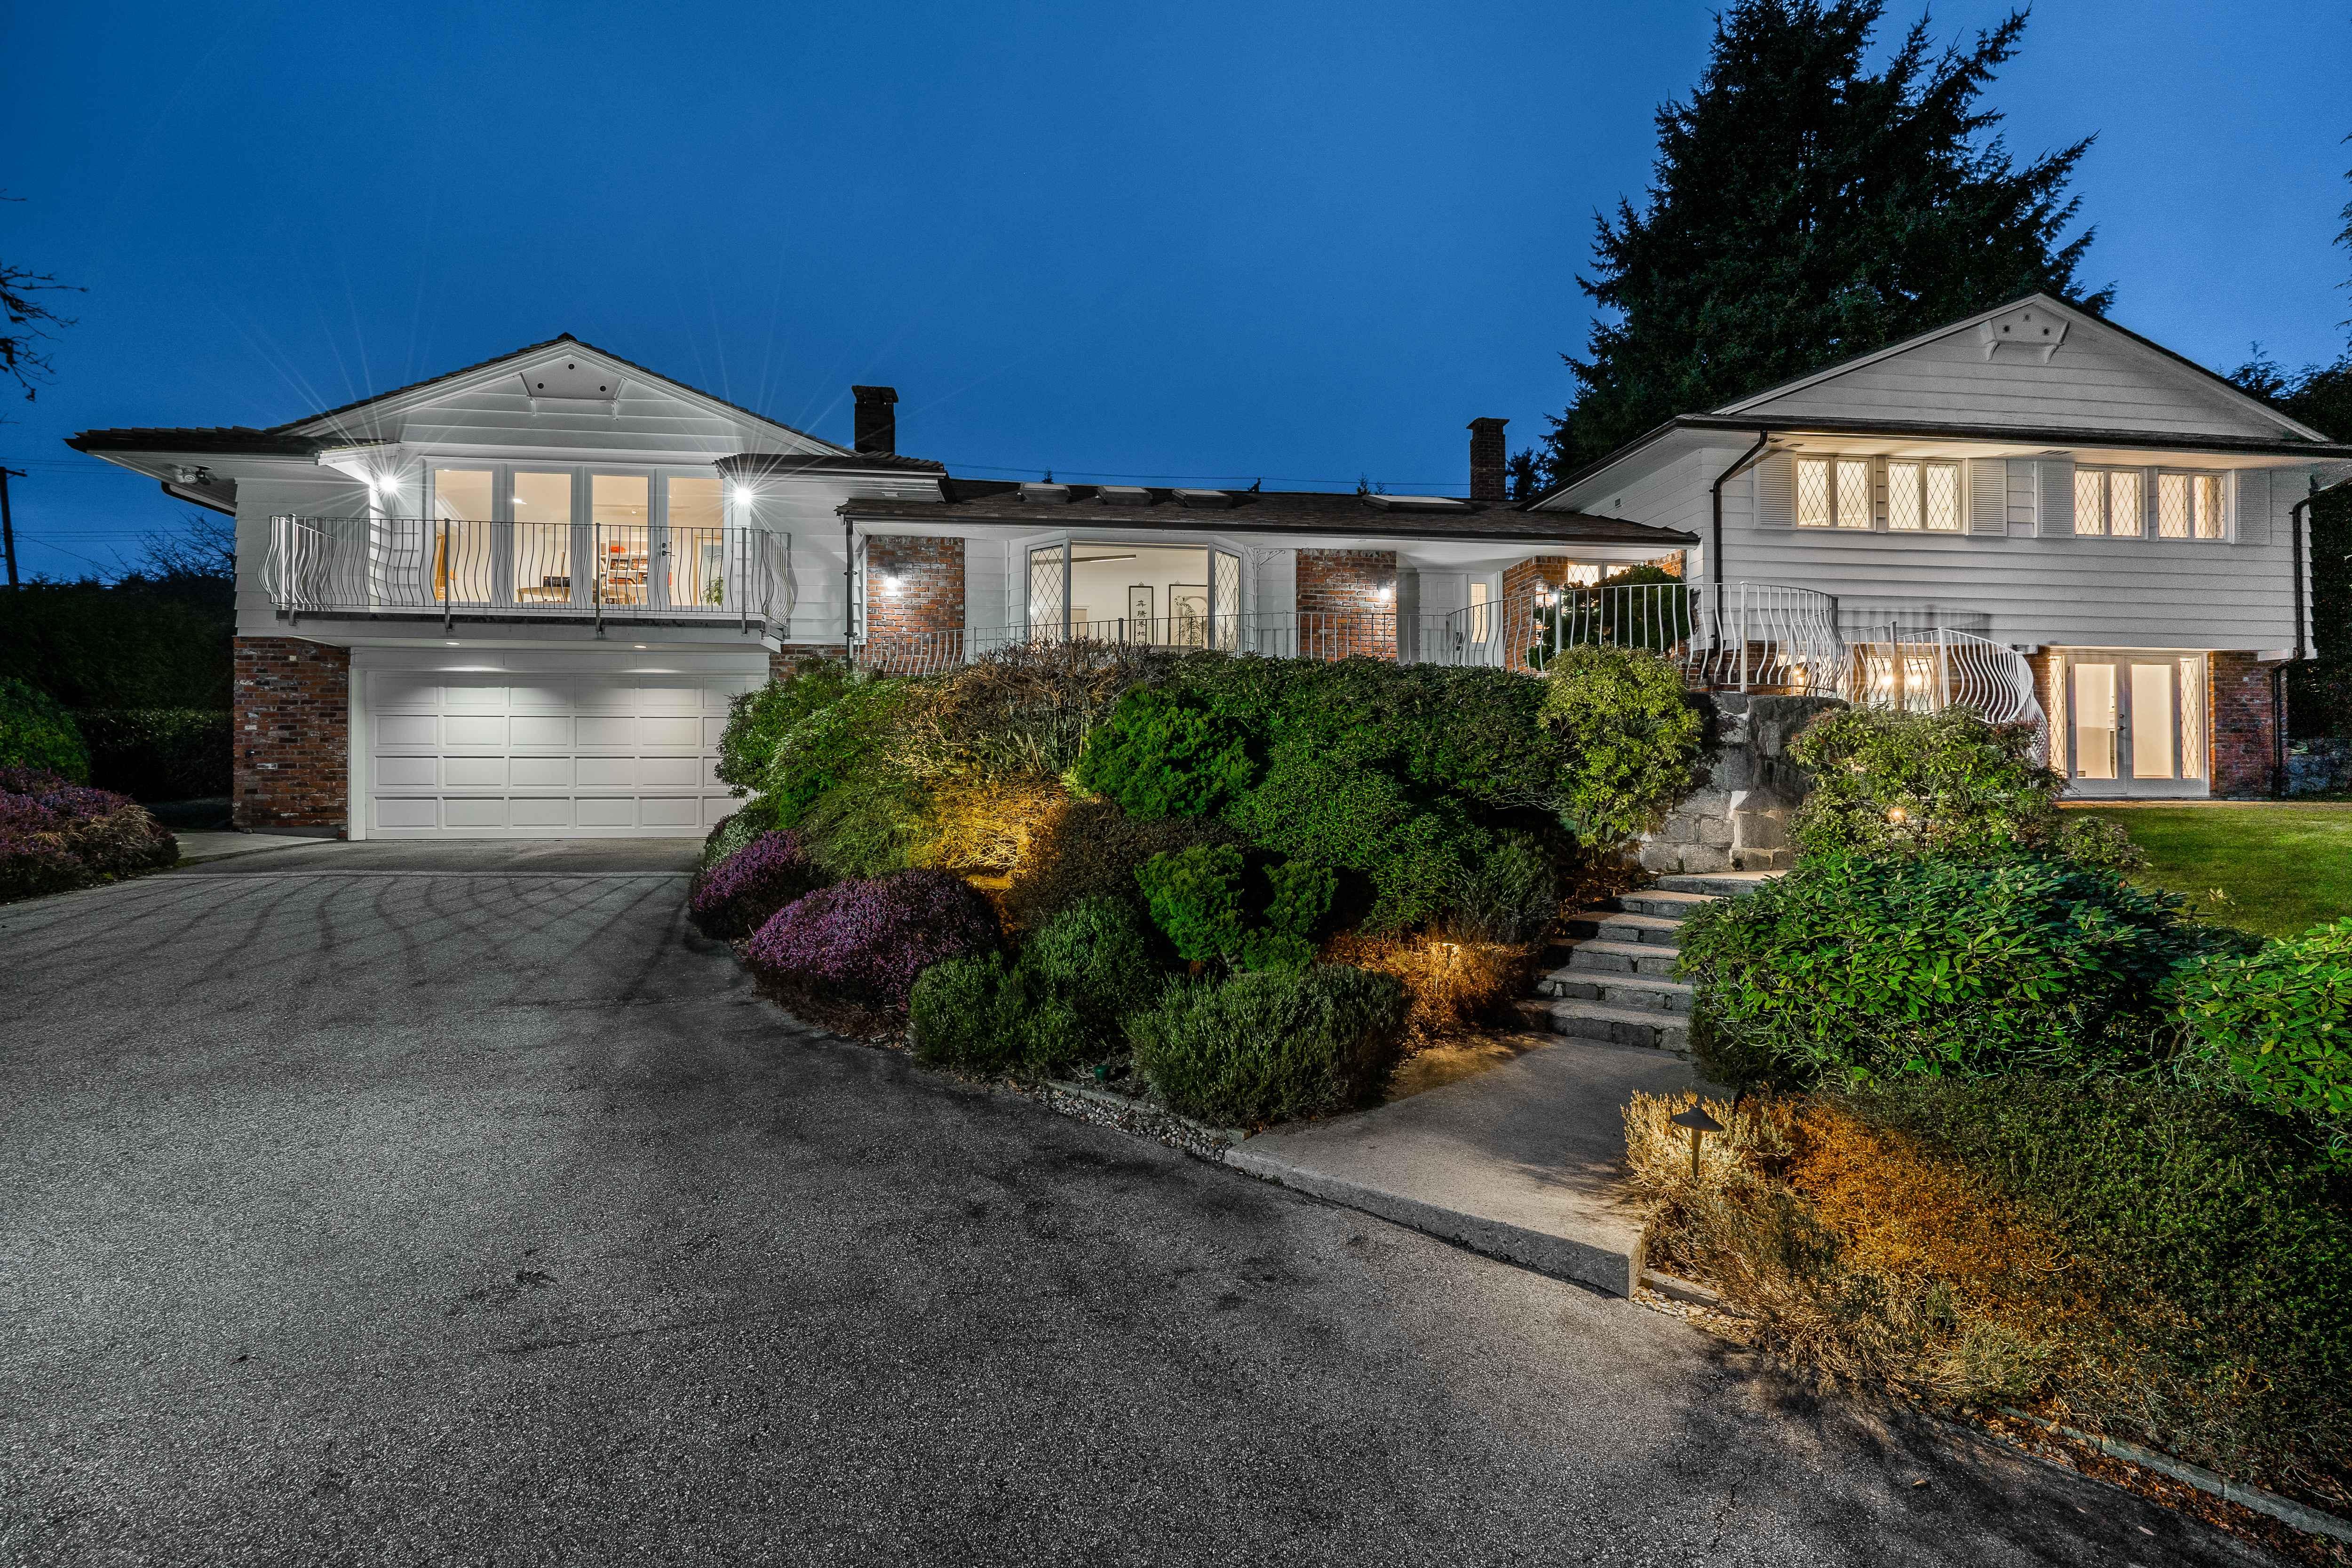 685 King Georges Way, British Properties, West Vancouver 3